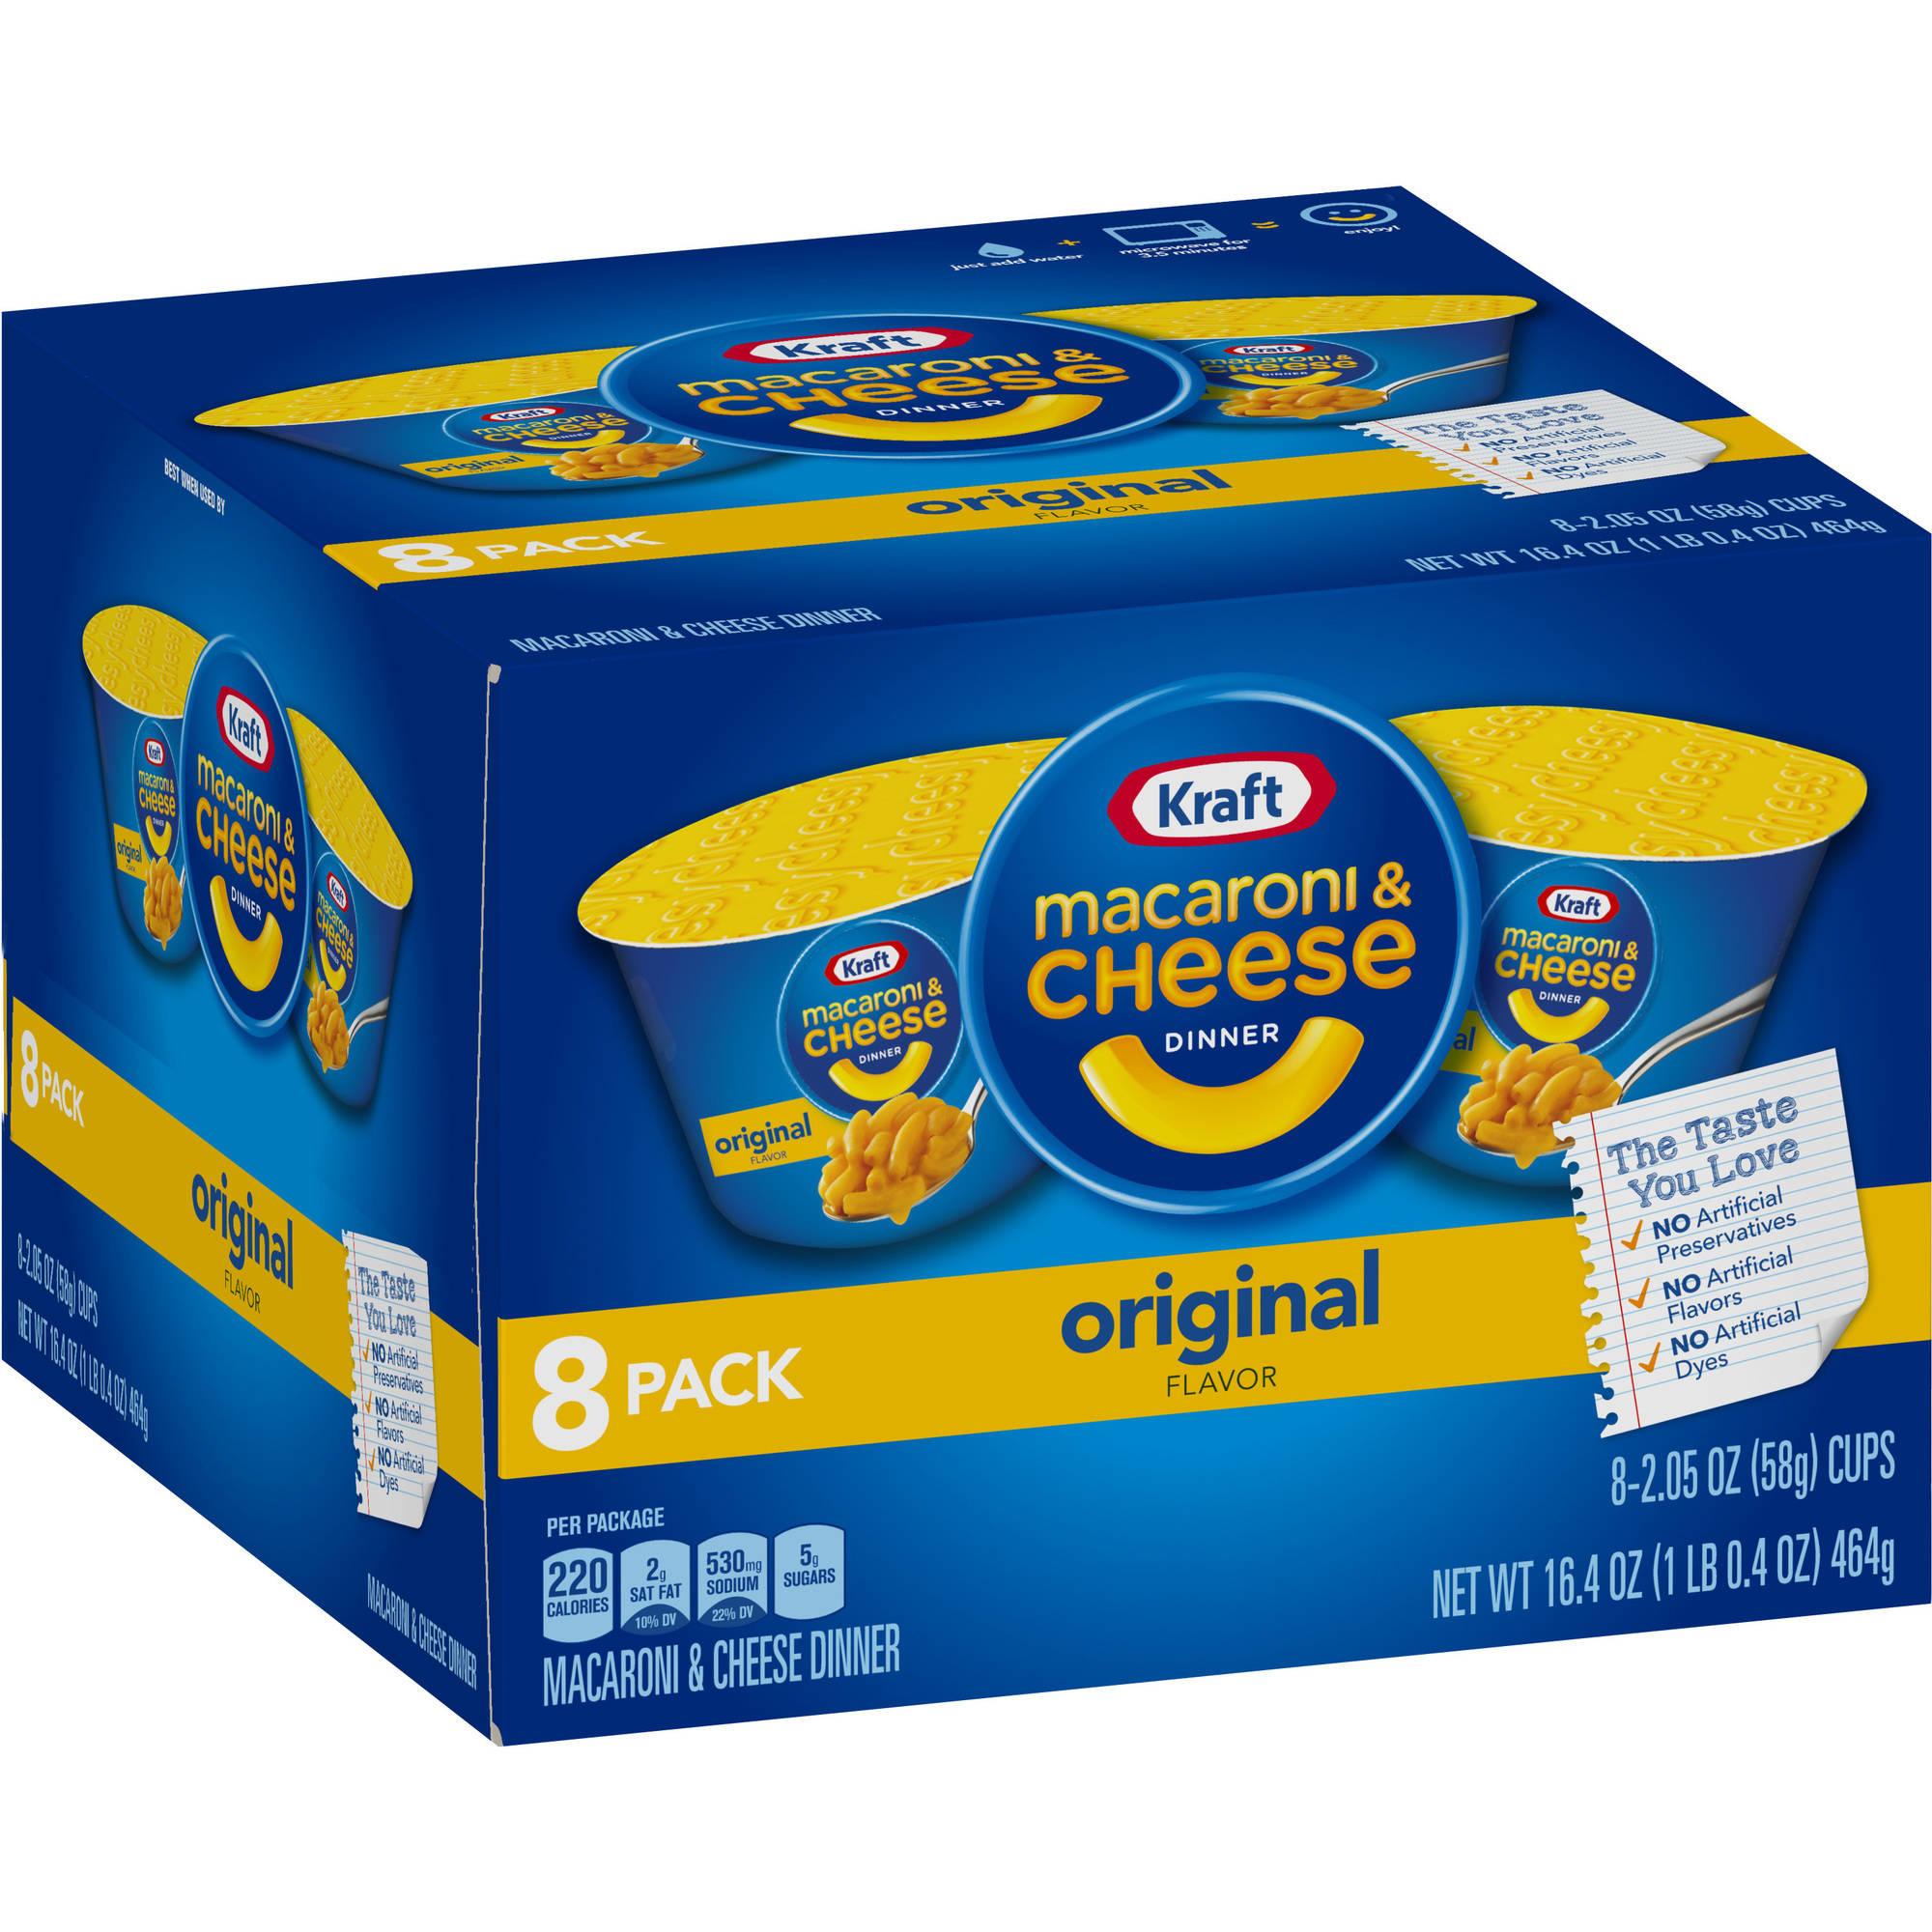 Kraft Original Flavor Macaroni & Cheese Dinner Single Serve Cups, 2.05 oz, 8 count